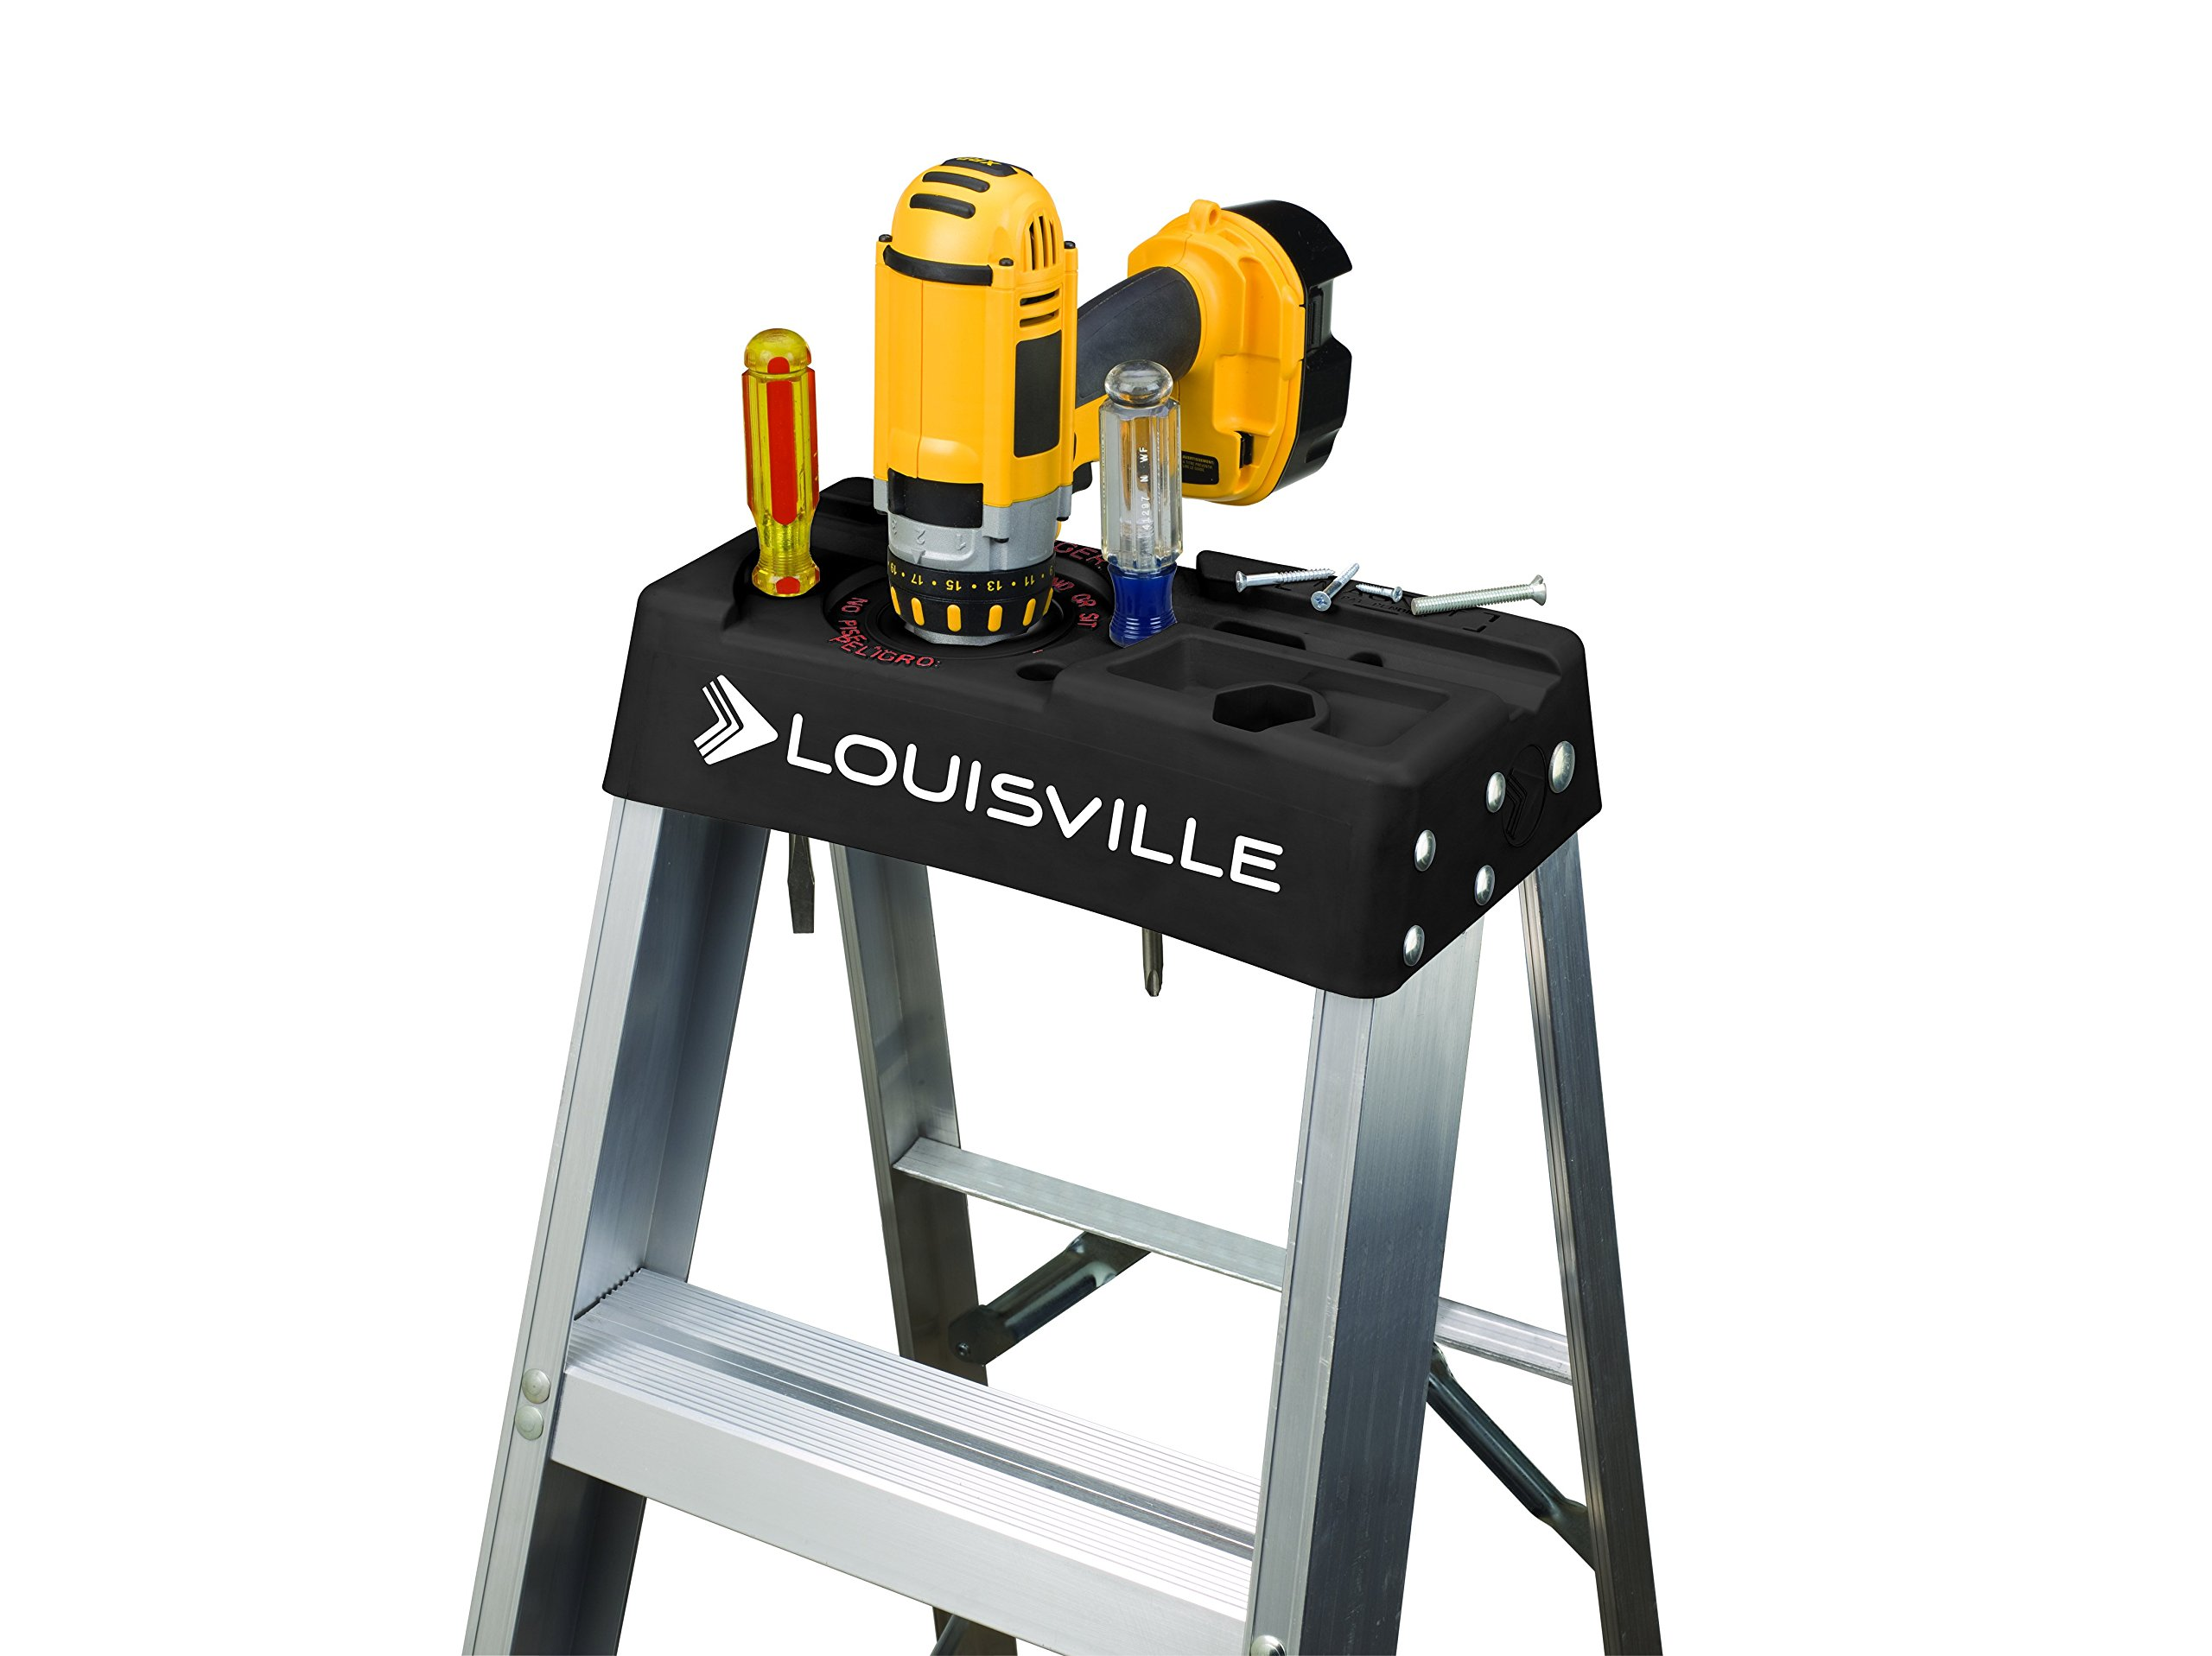 Louisville Ladder AS3008 300-Pound Duty Rating Aluminum Stepladder, 8-Foot